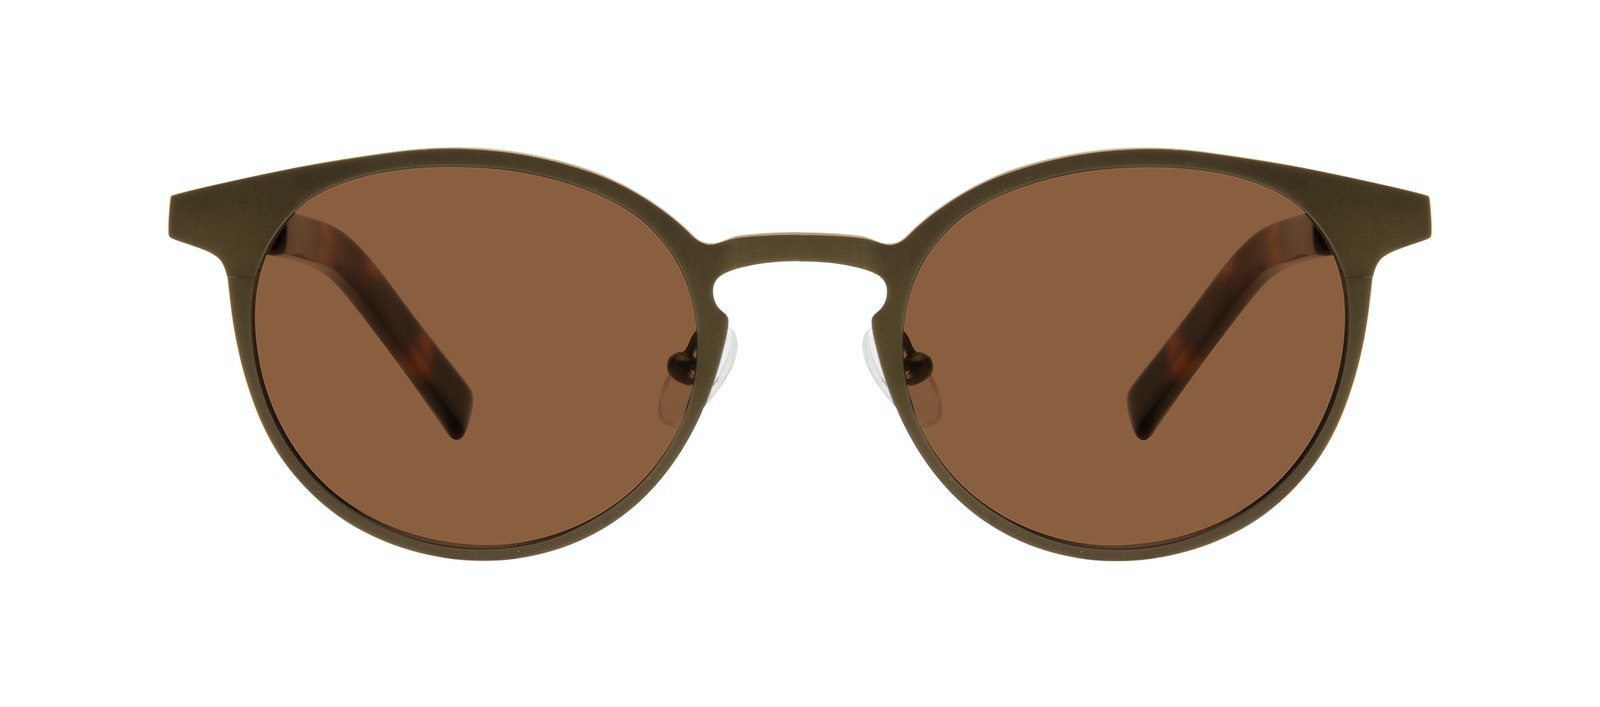 Affordable Fashion Glasses Round Sunglasses Men Cut Khaki Front